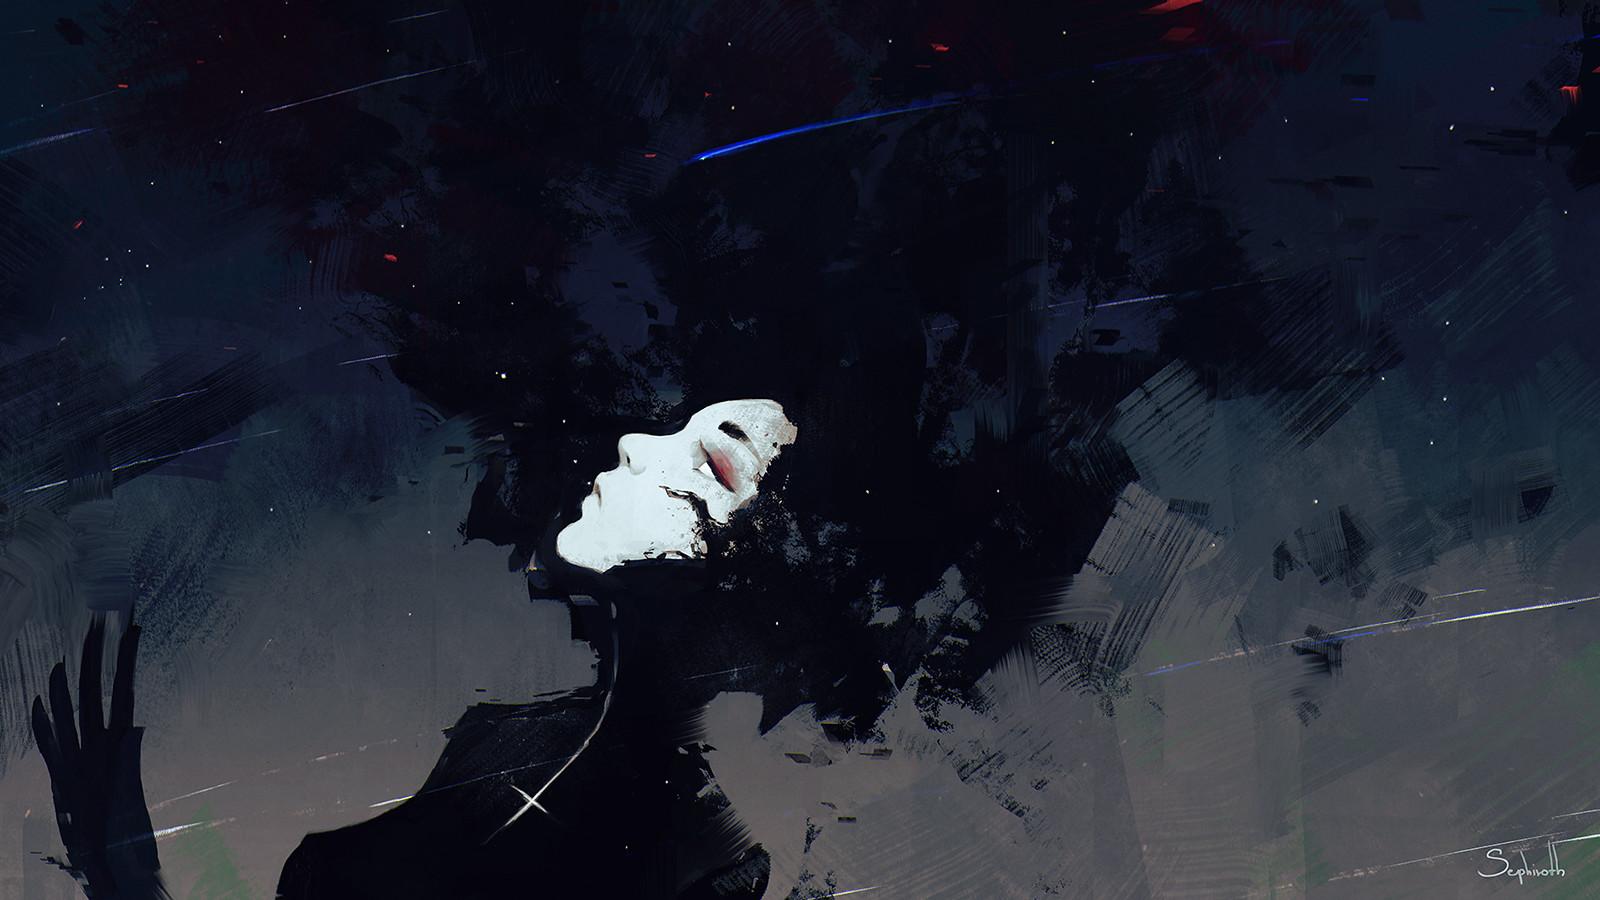 https://cdna.artstation.com/p/assets/images/images/007/781/608/large/sephiroth-art-promise.jpg?1508459533